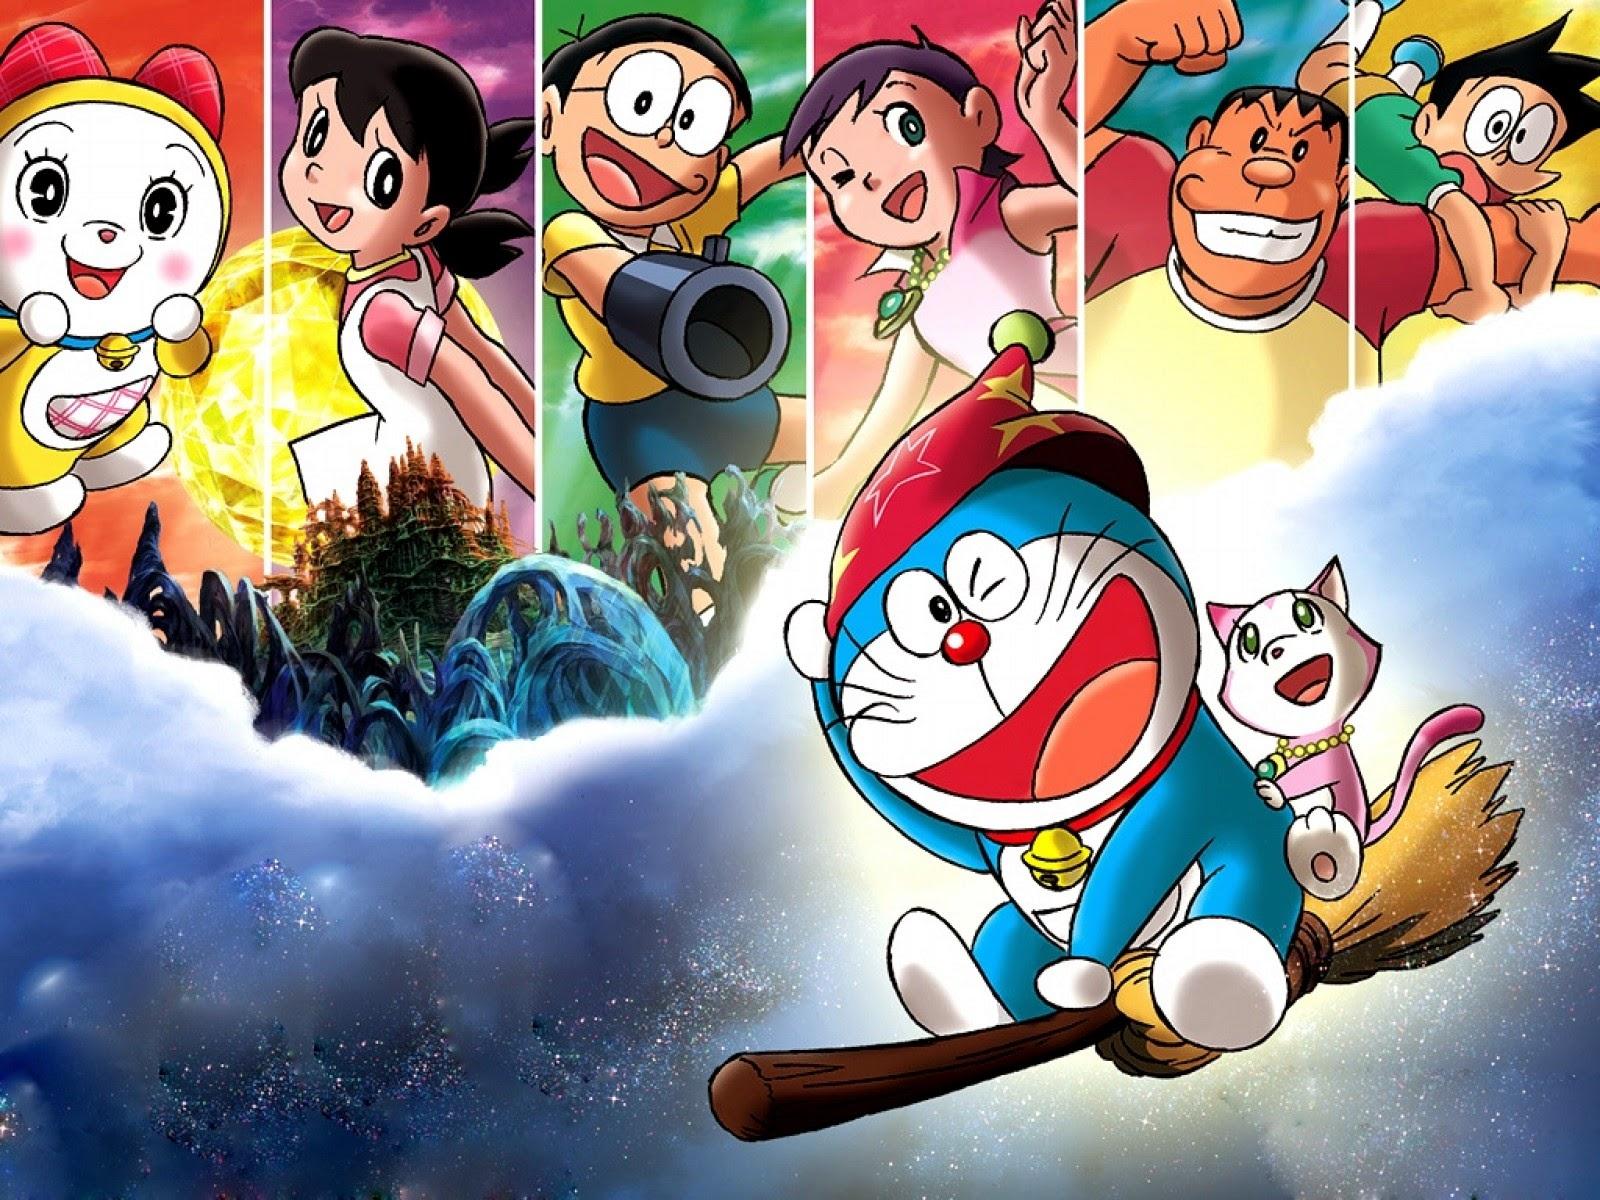 Kumpulan Gambar Kartun Doraemon Terbaru  Bestkartun